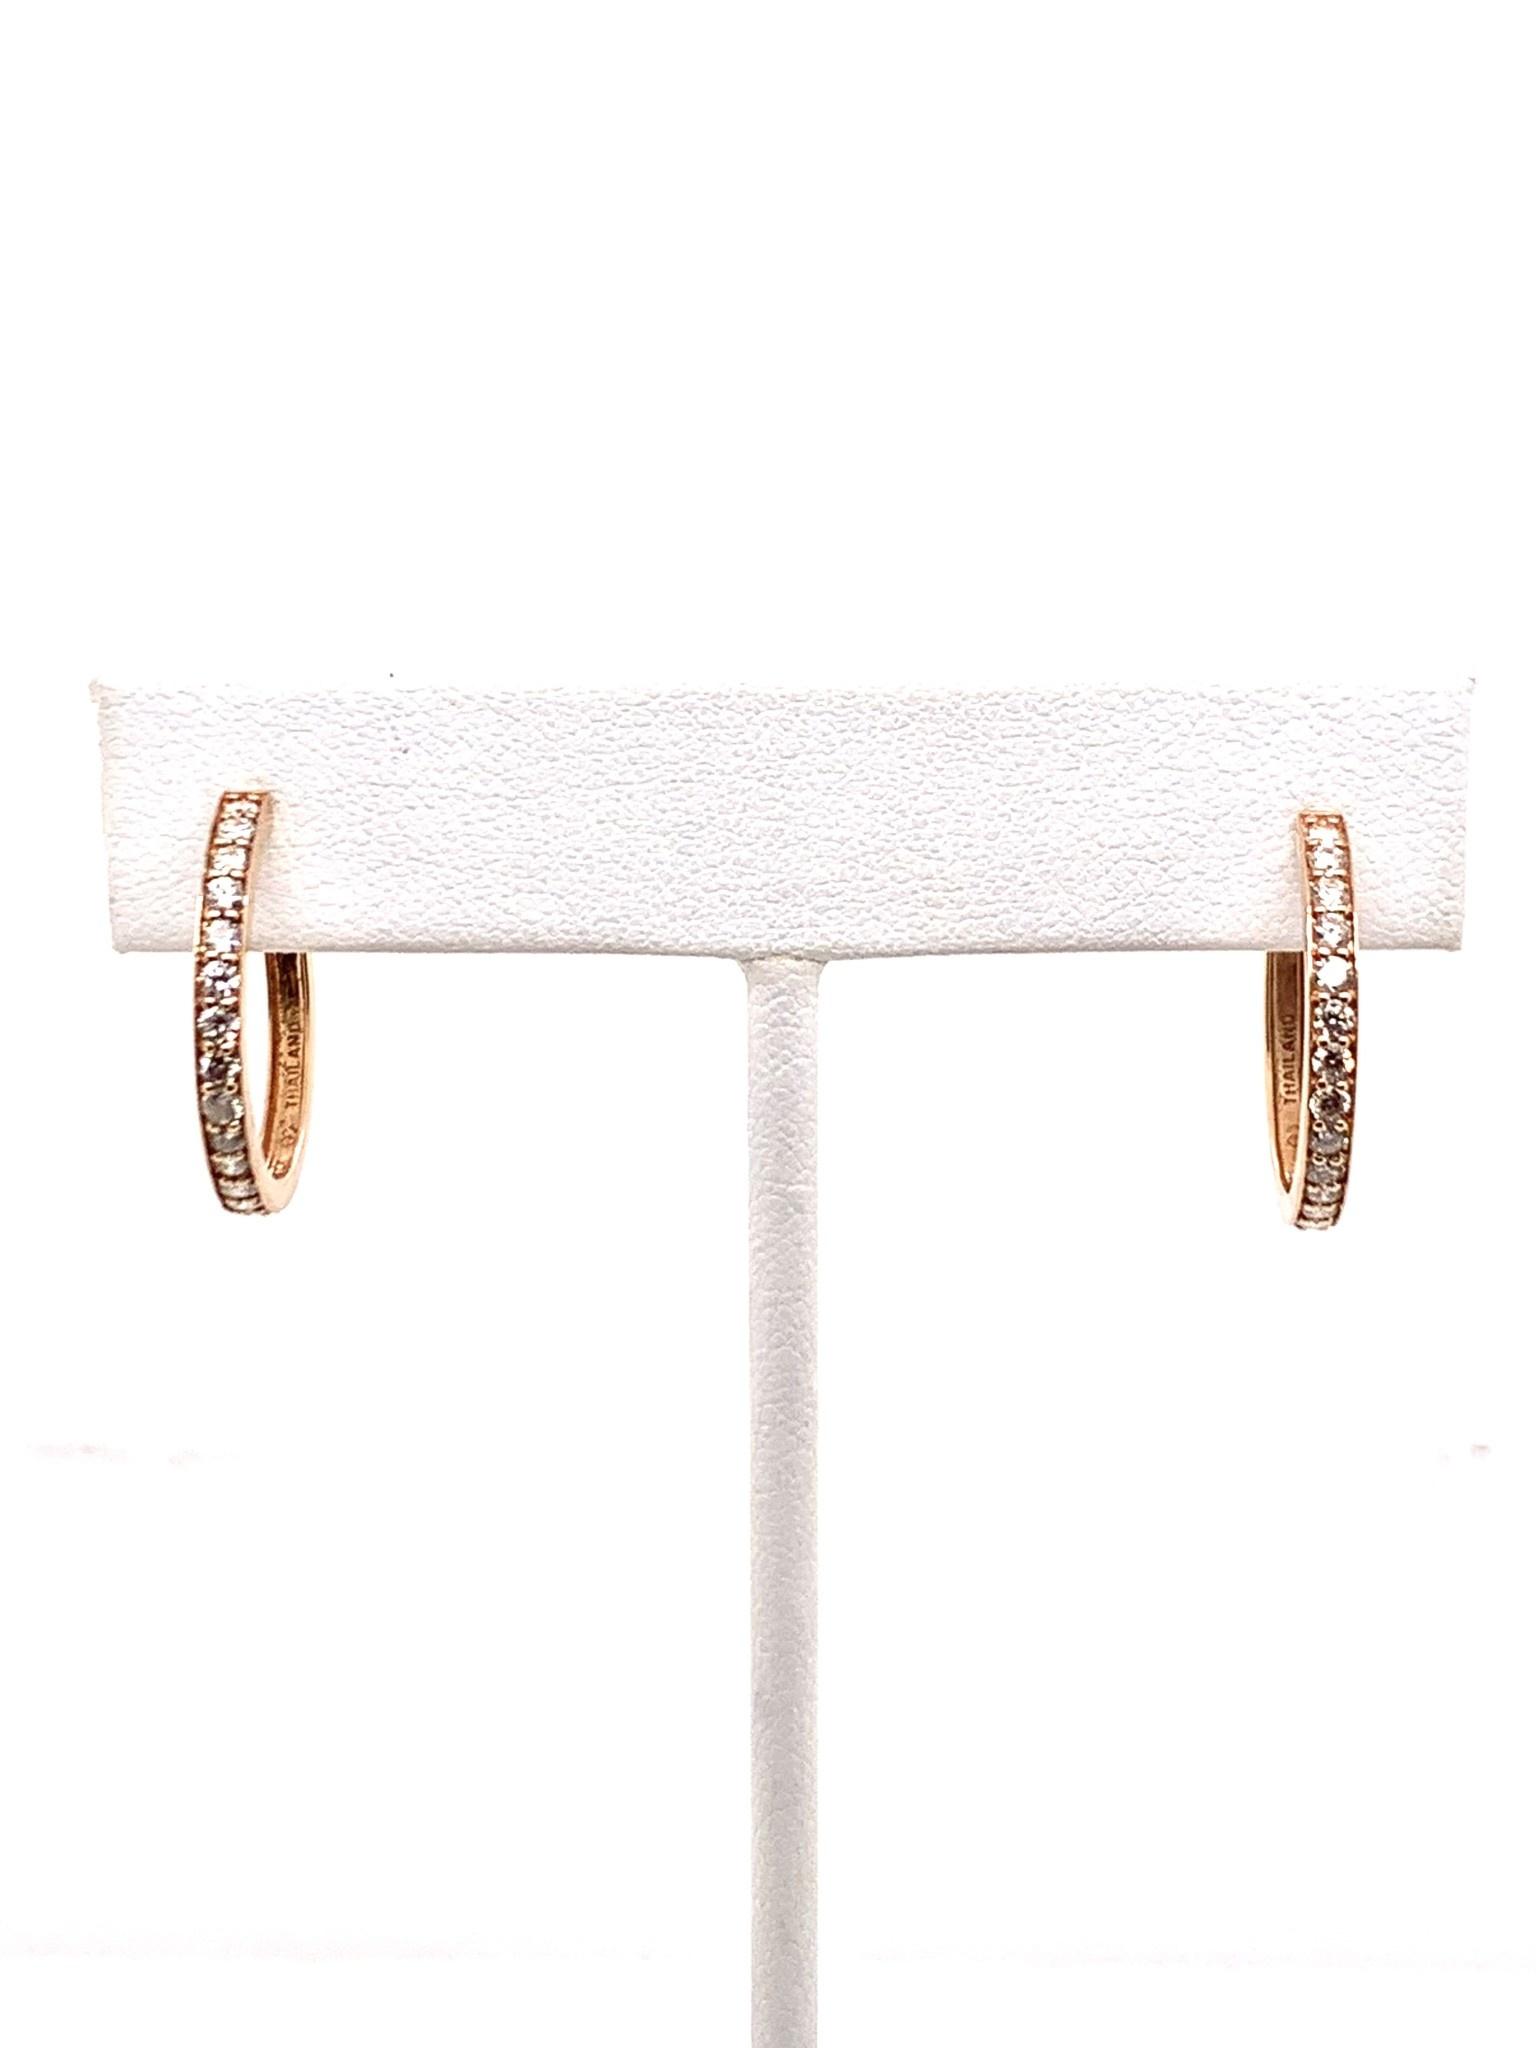 14K rose gold diamond hoop earrings 0.75ctw